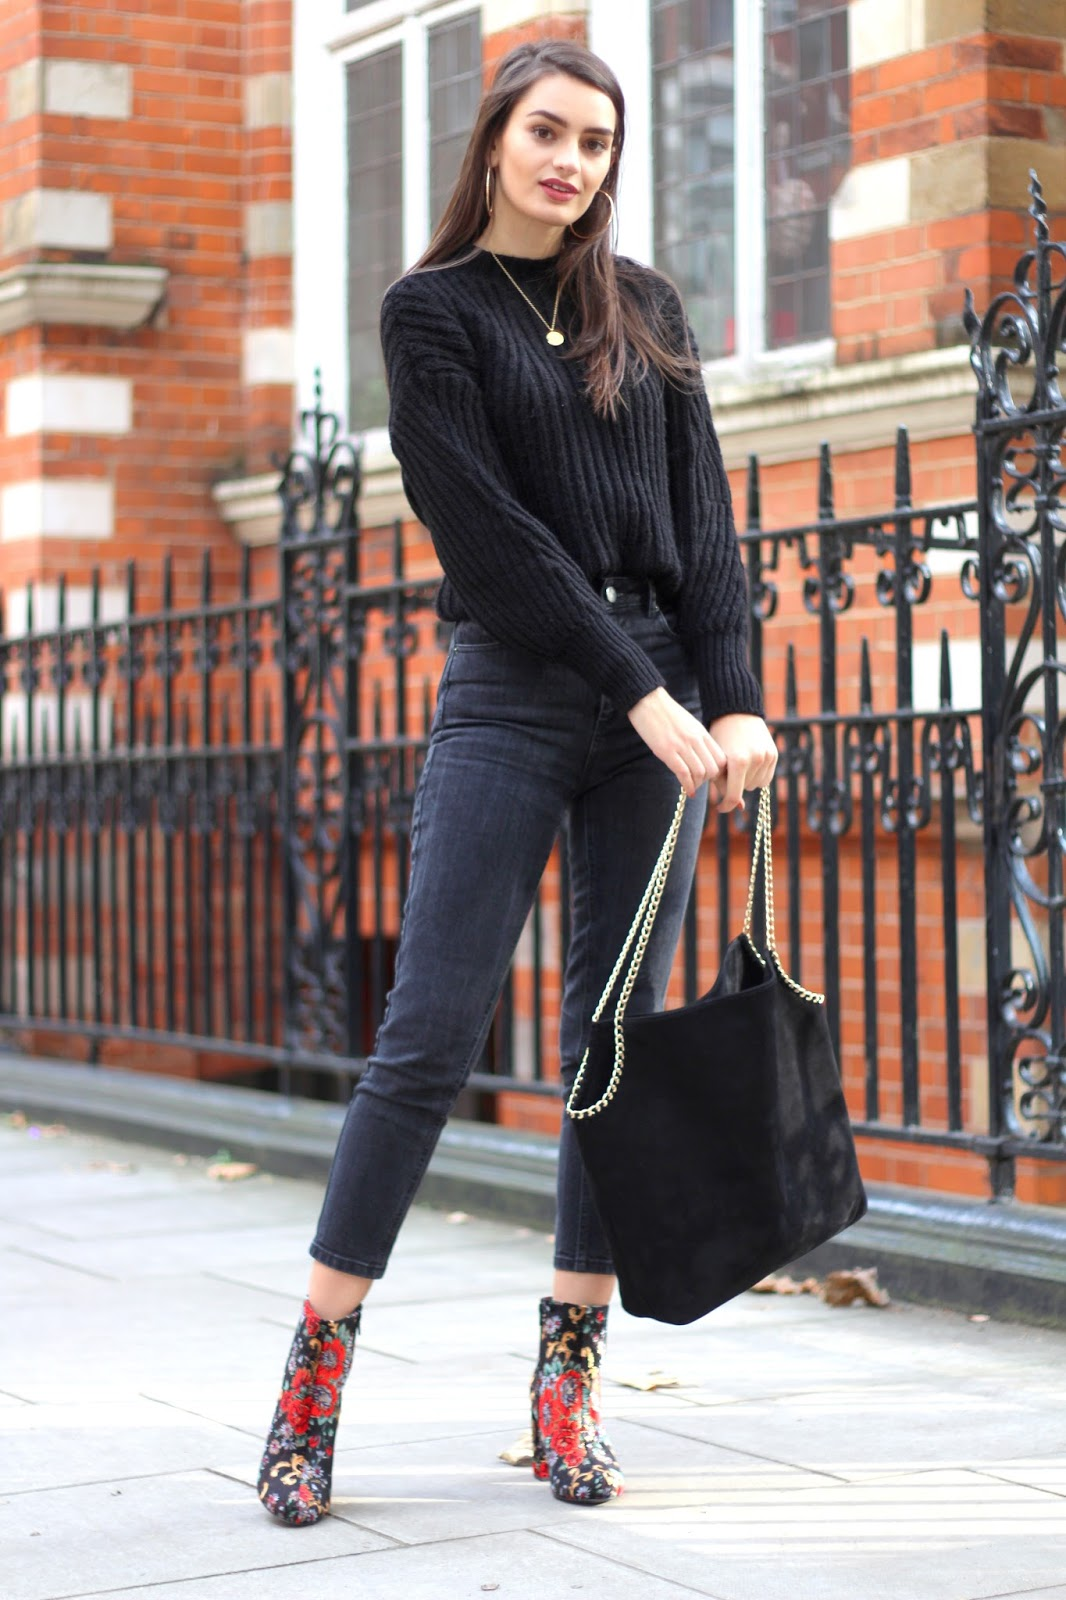 autumn personal style blogger london peexo